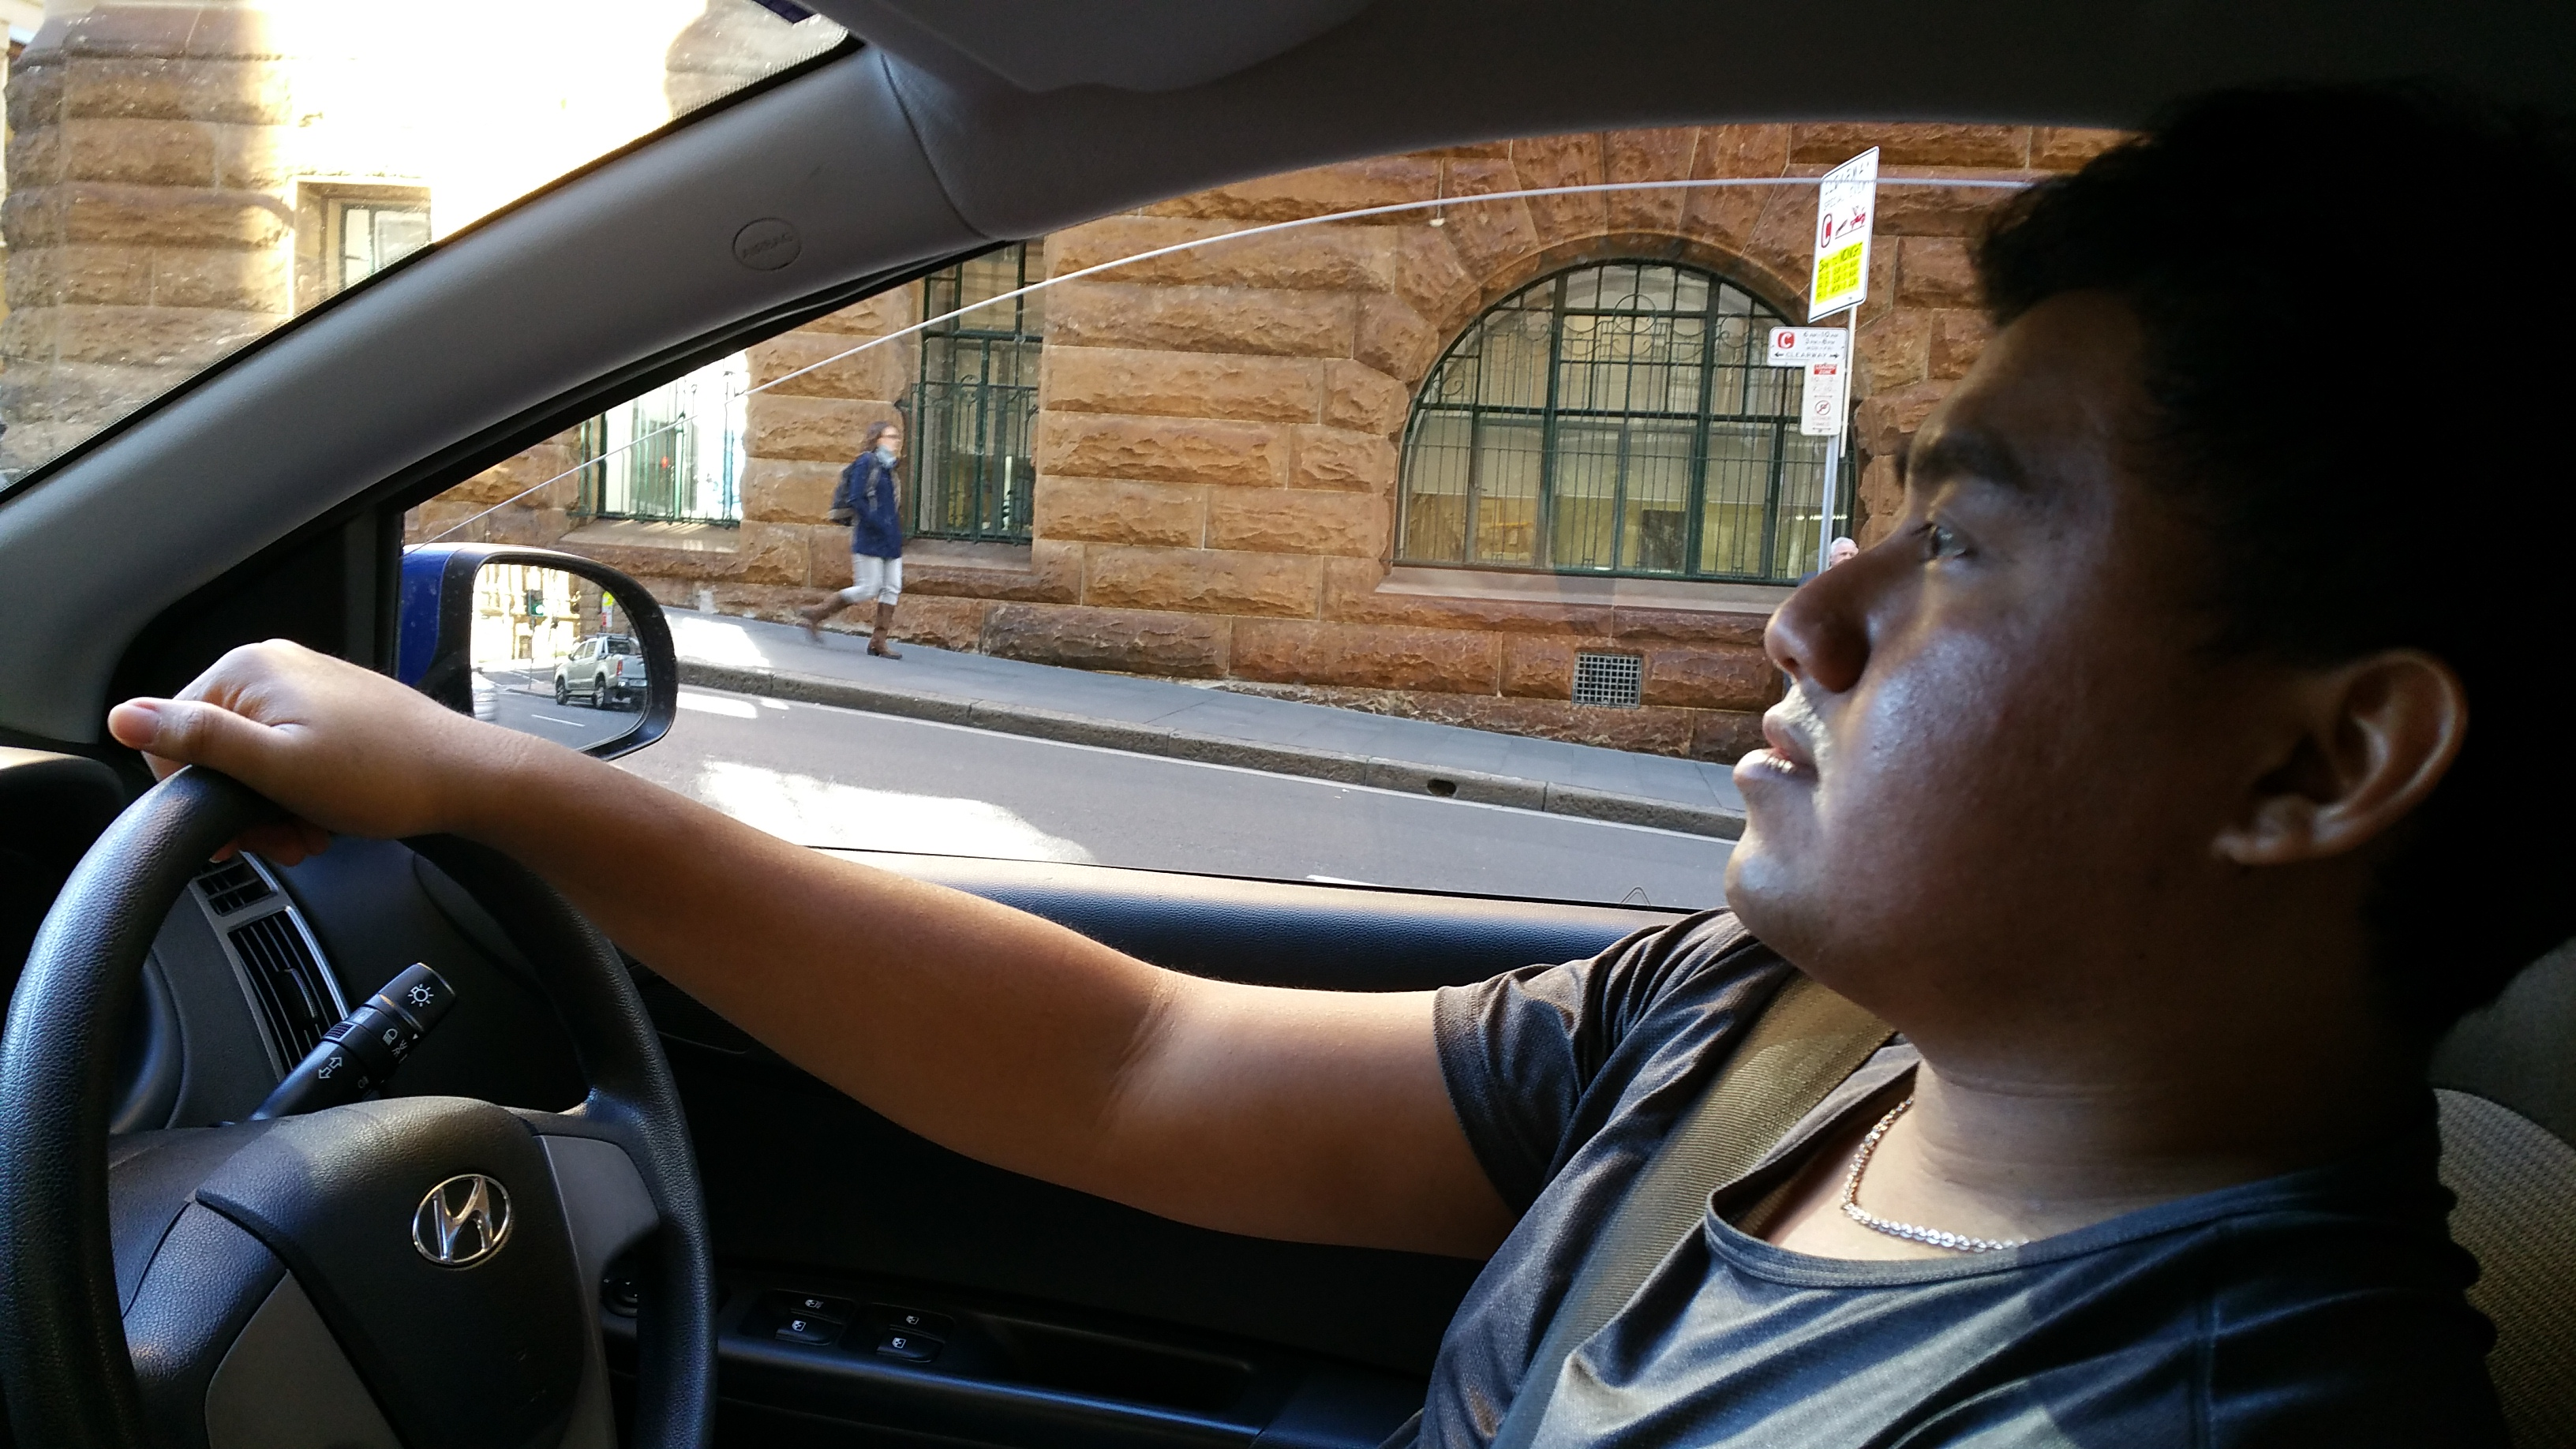 Jay Chua driving in Sydney Australia